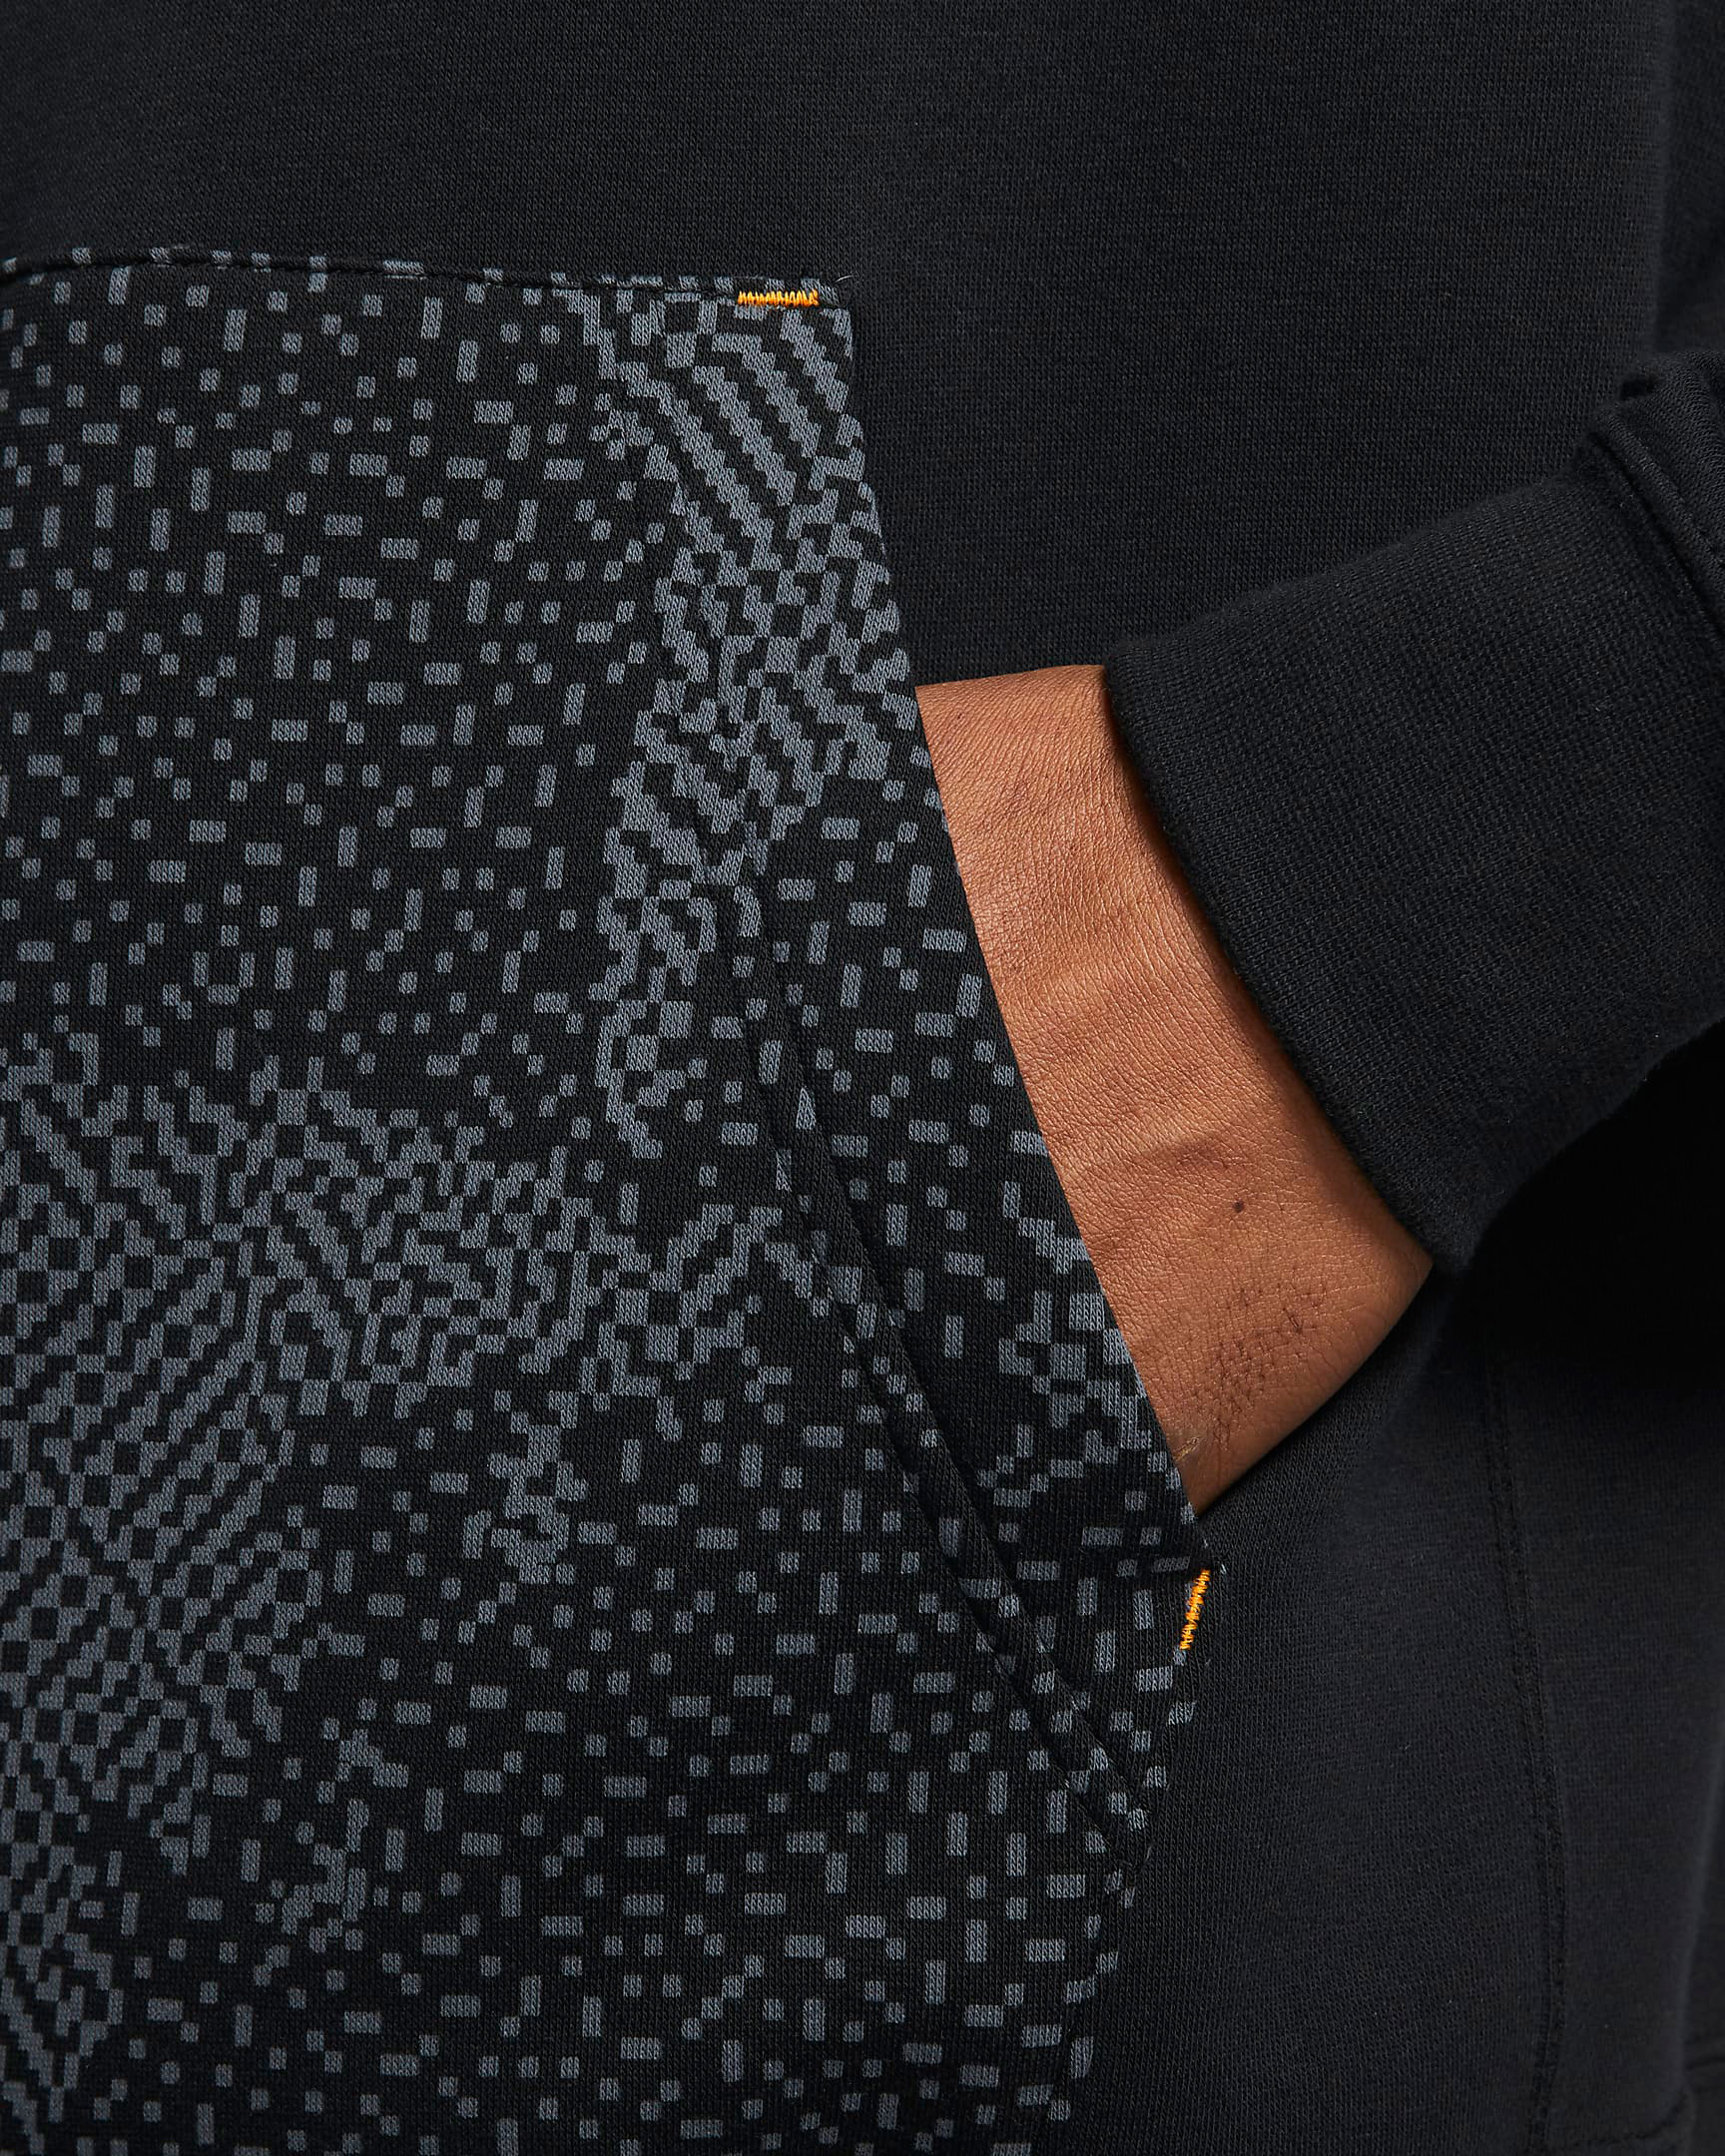 jordan-9-university-gold-nike-hoodie-4